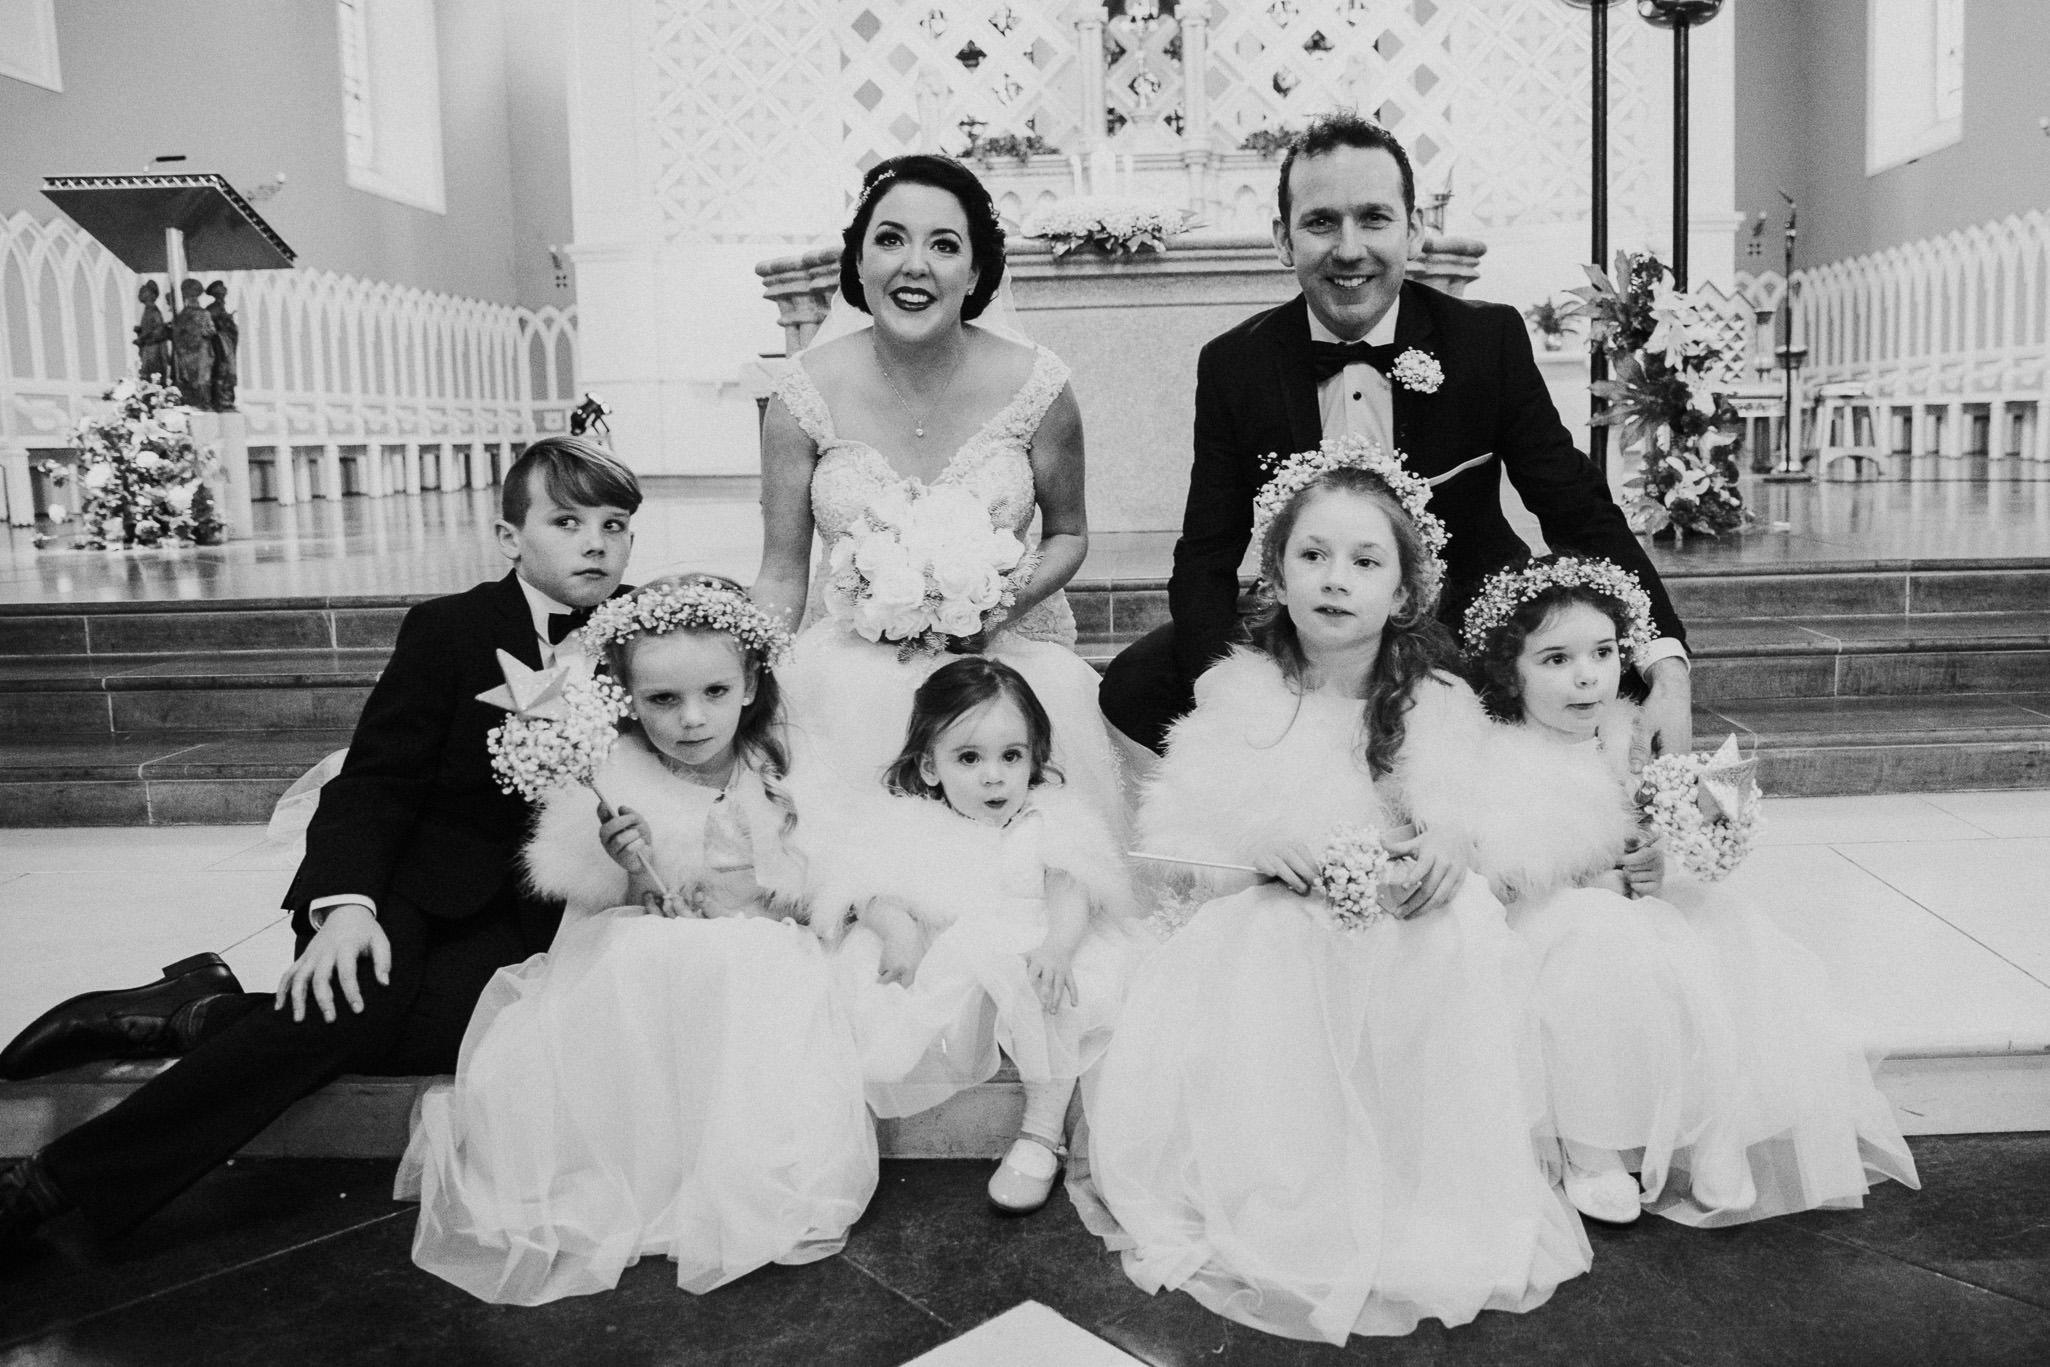 clairebyrnephotography-wedding-sparklers-christmas-orlagh-daithi-6.jpg